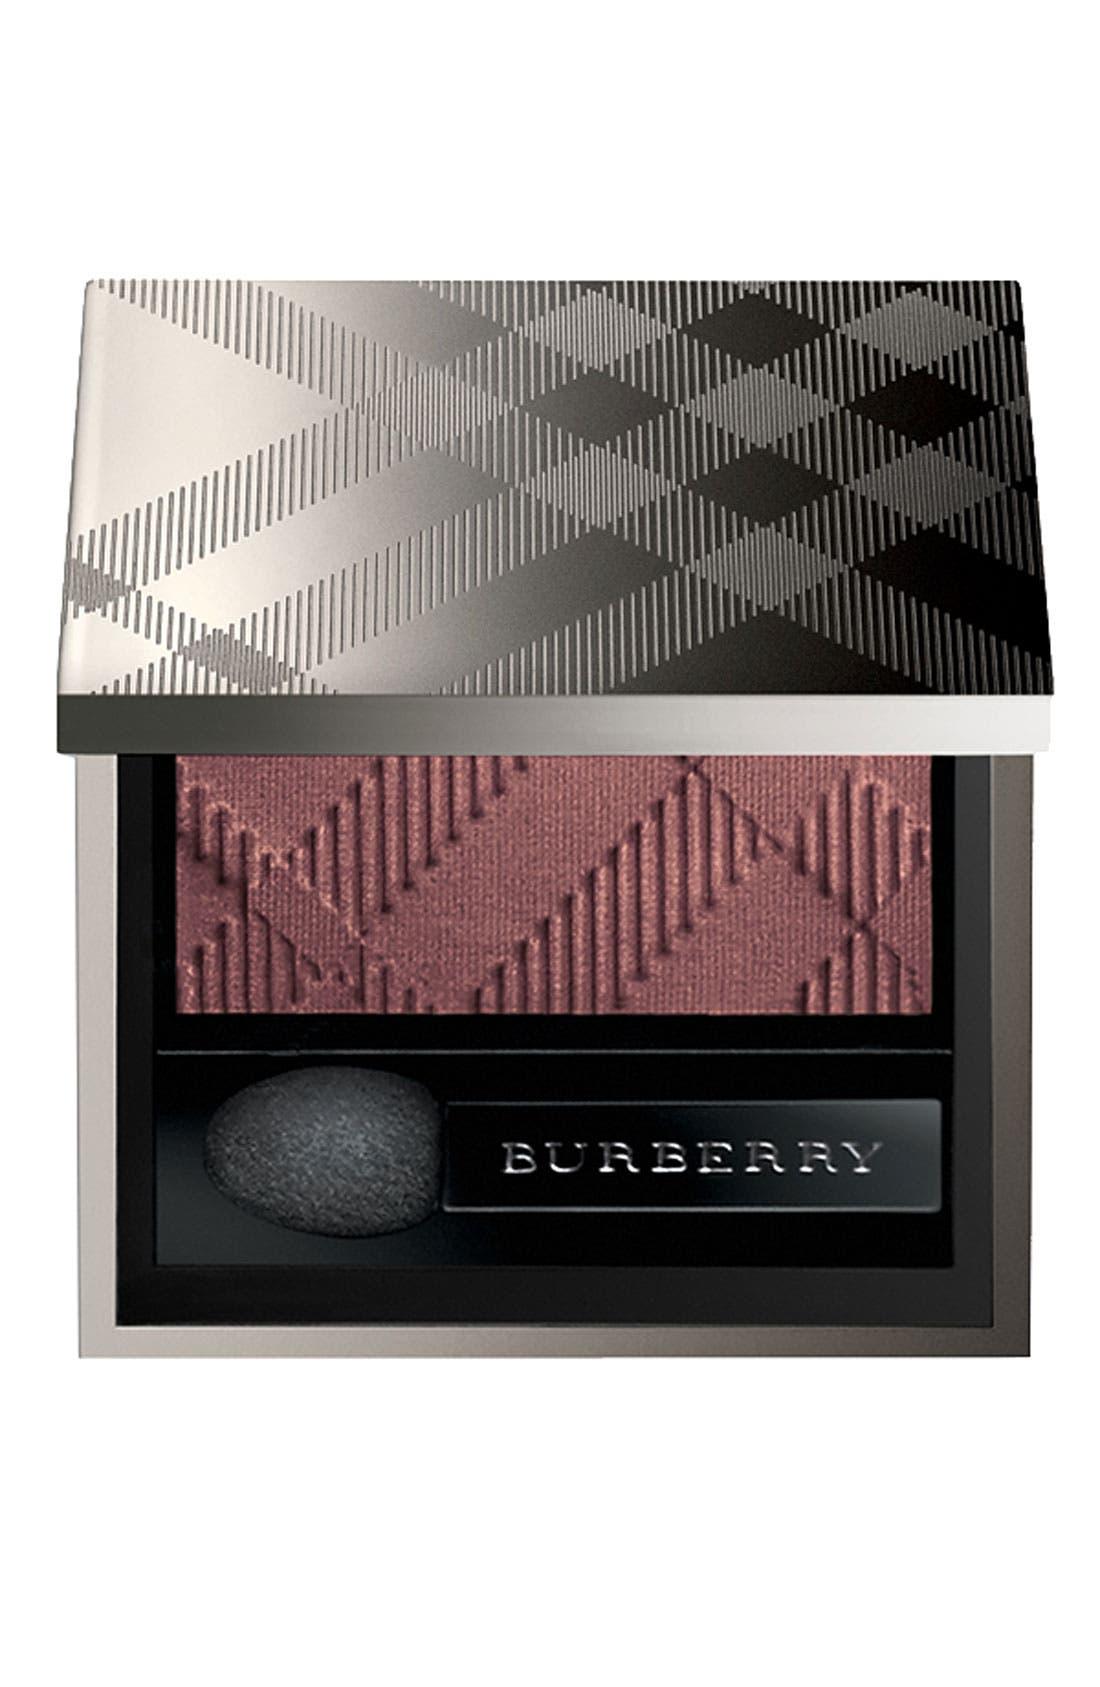 BURBERRY BEAUTY Sheer Eyeshadow, Main, color, 001